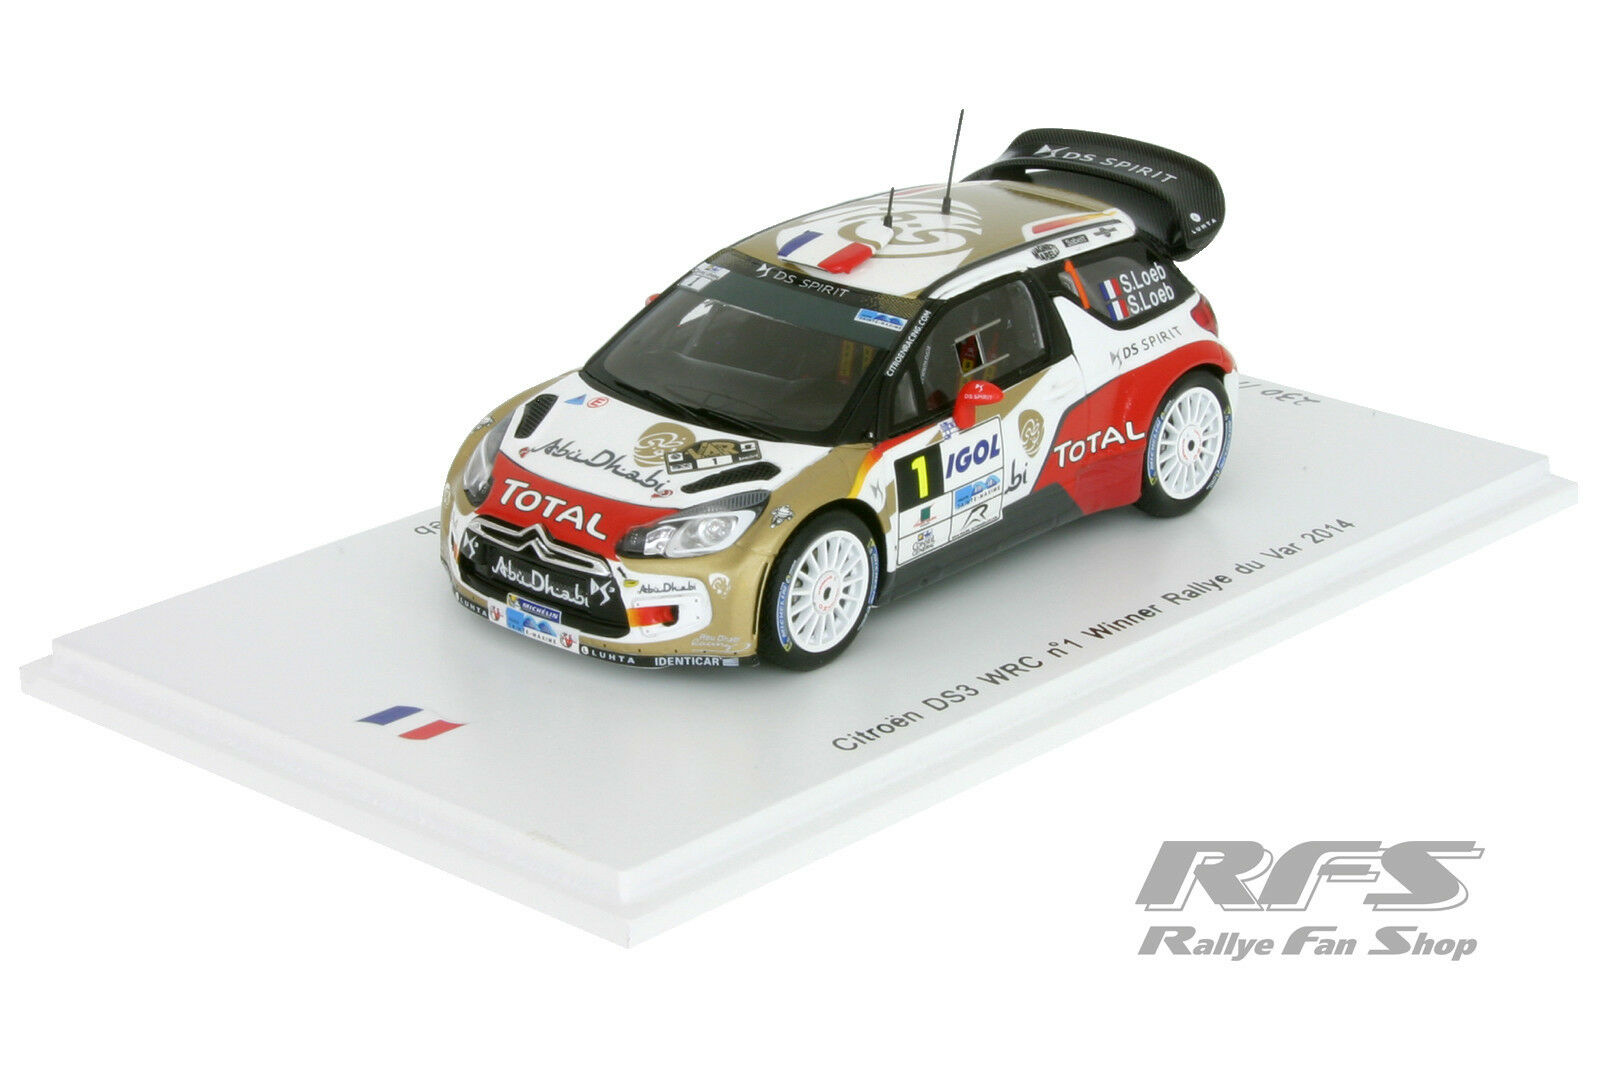 CITROEN ds3 wrc-Loeb Loeb-rallye tu  var 2014 - 1 43 spark sf081  limite acheter